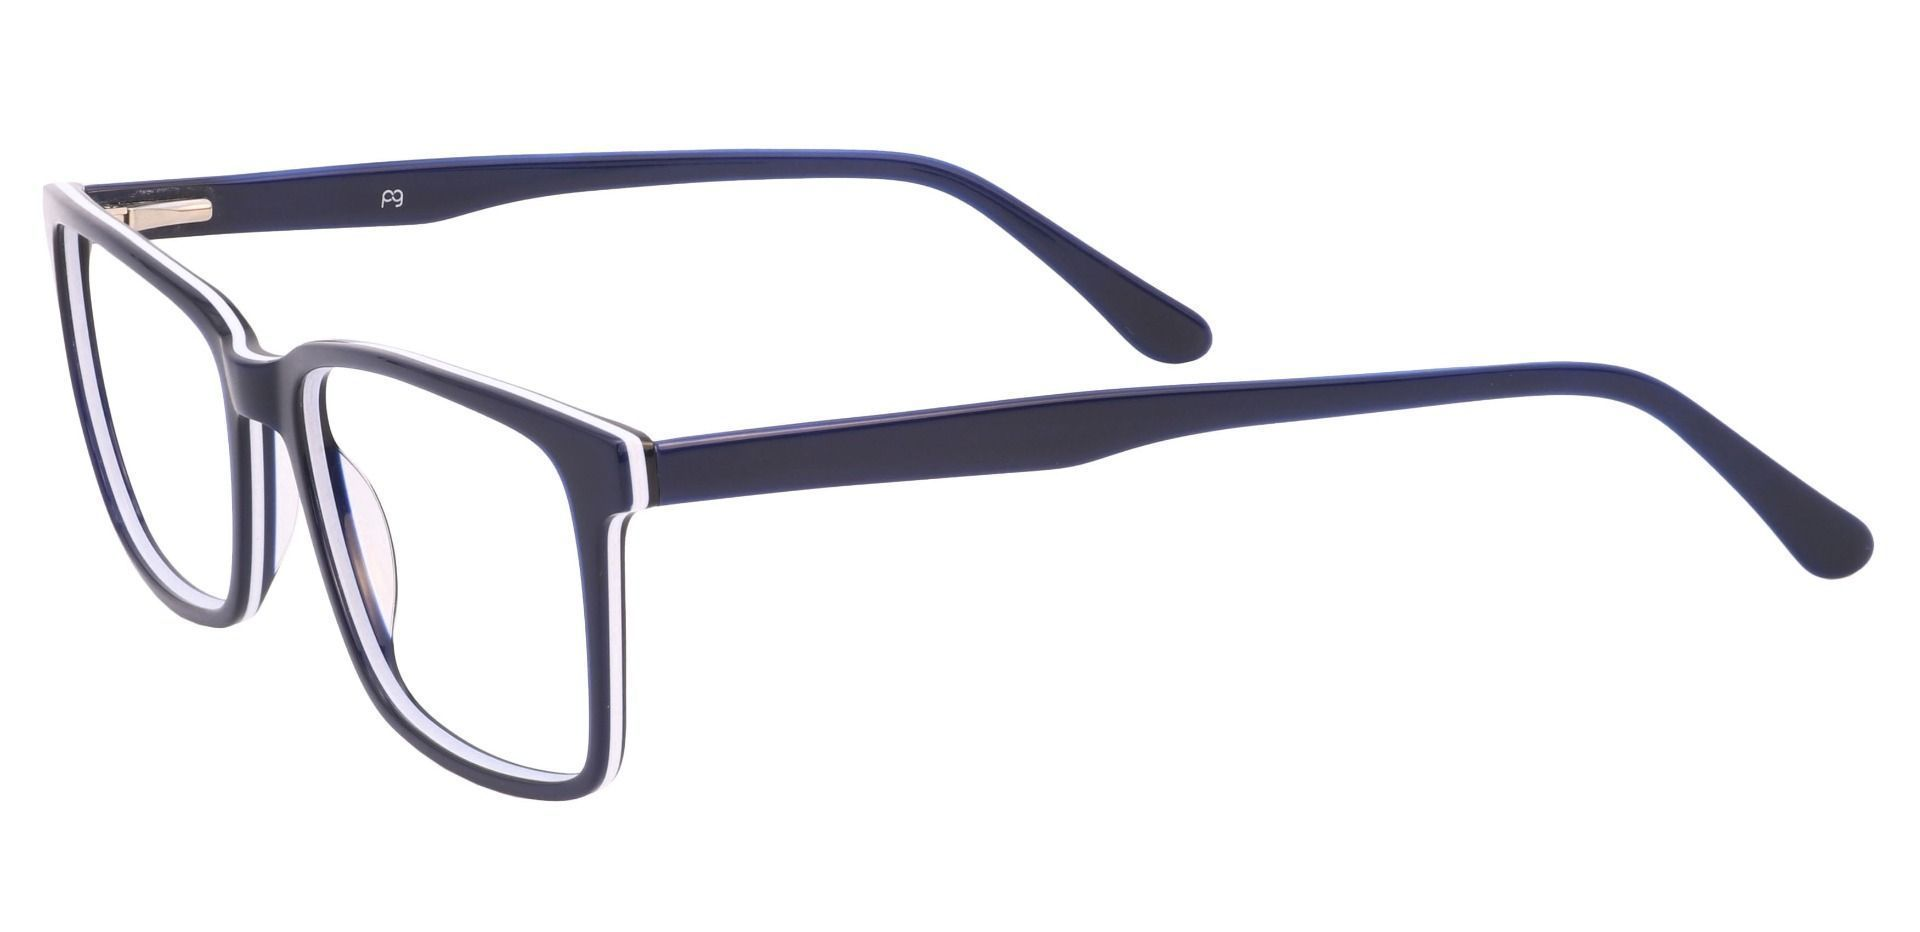 Venice Rectangle Prescription Glasses - Blue